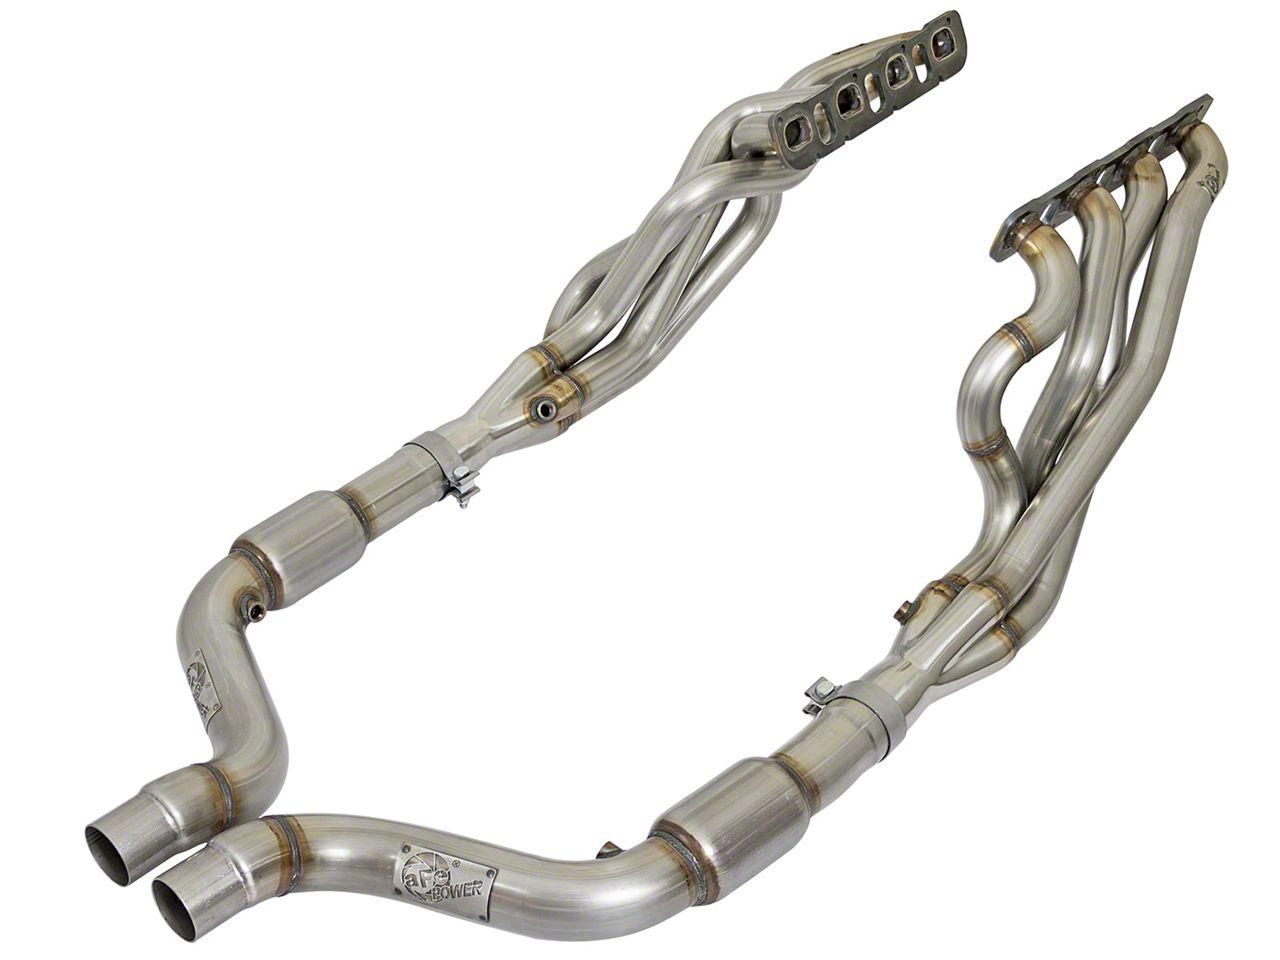 AFE 2 in. Twisted Steel Long Tube Headers & Catted Mid-Pipe - Street Series (15-18 6.2L HEMI, 6.4L HEMI)